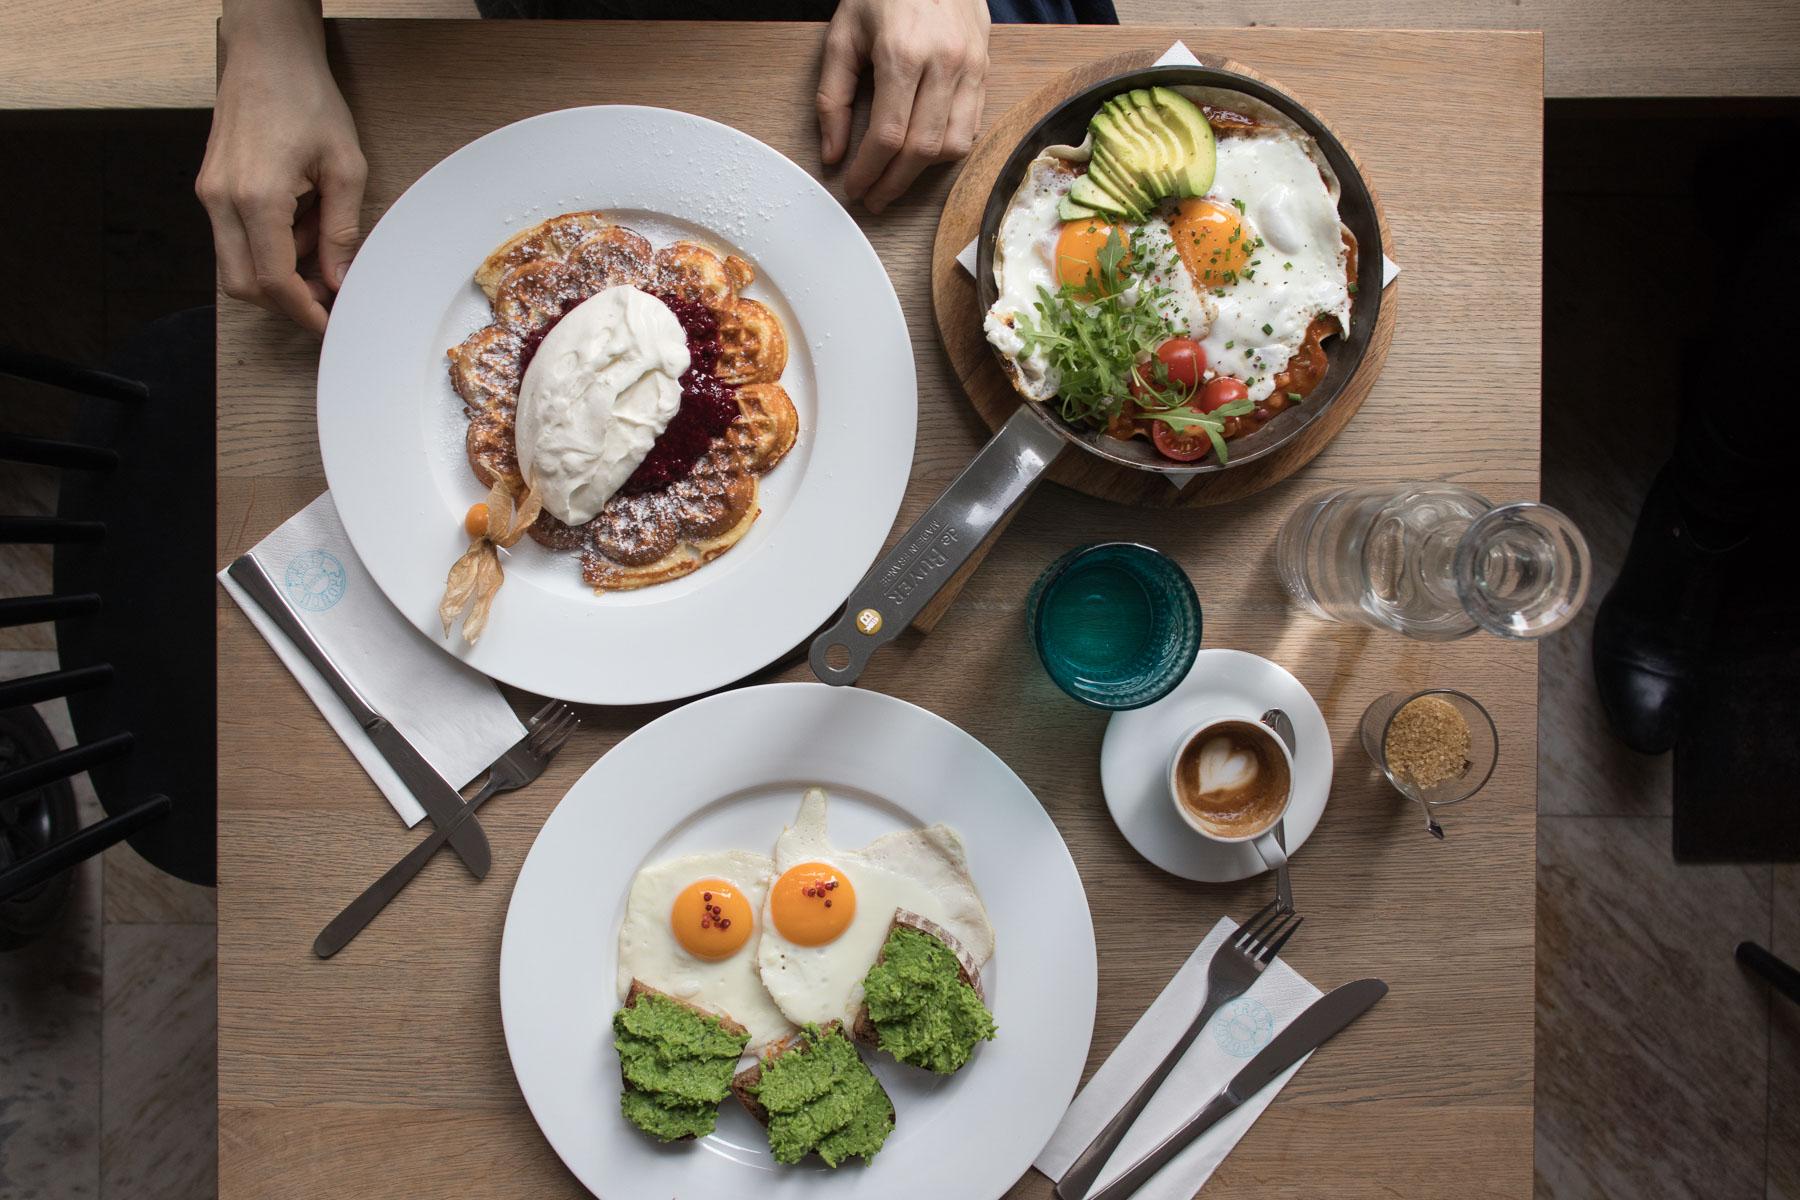 Breakfast at Proti proudu, Prague